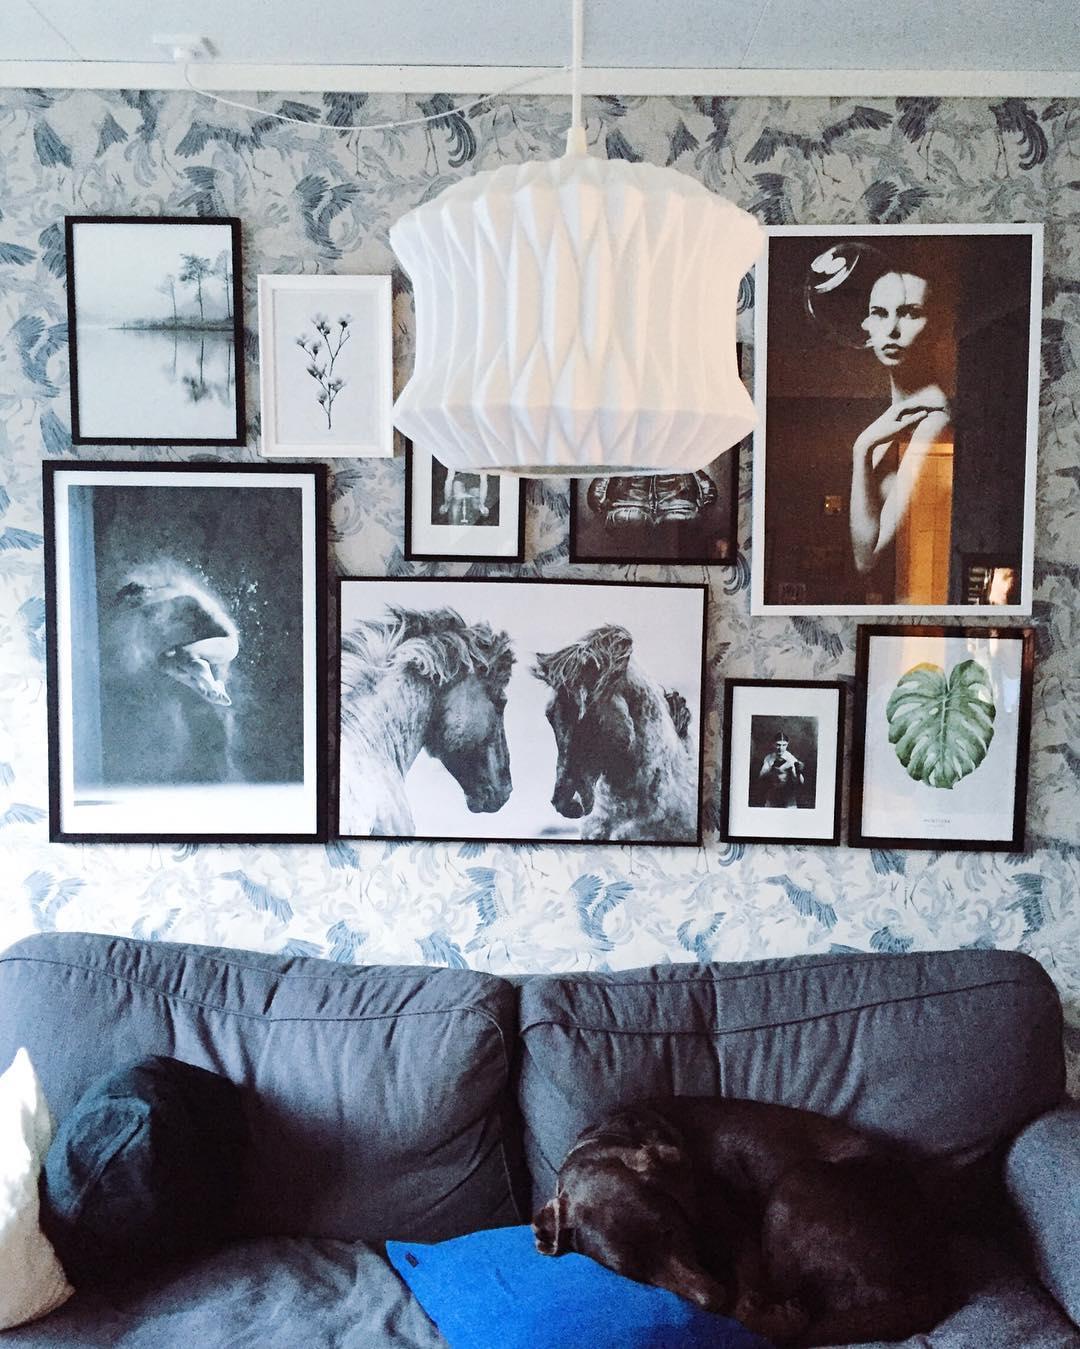 When my man is out drinking beer -- this is what I do: making collages. #desenio #sponset #tusenogenhatt #tusenogenhattcom #rom123 #boligliv #boligdrøm #boligpluss #interior4all #boligliv_dk #vakrehjemoginteriør #heminredning #kkliving #elledecoration #apartmenttherapy #boliginretning #boligliv #rumrum #livingroom #collage